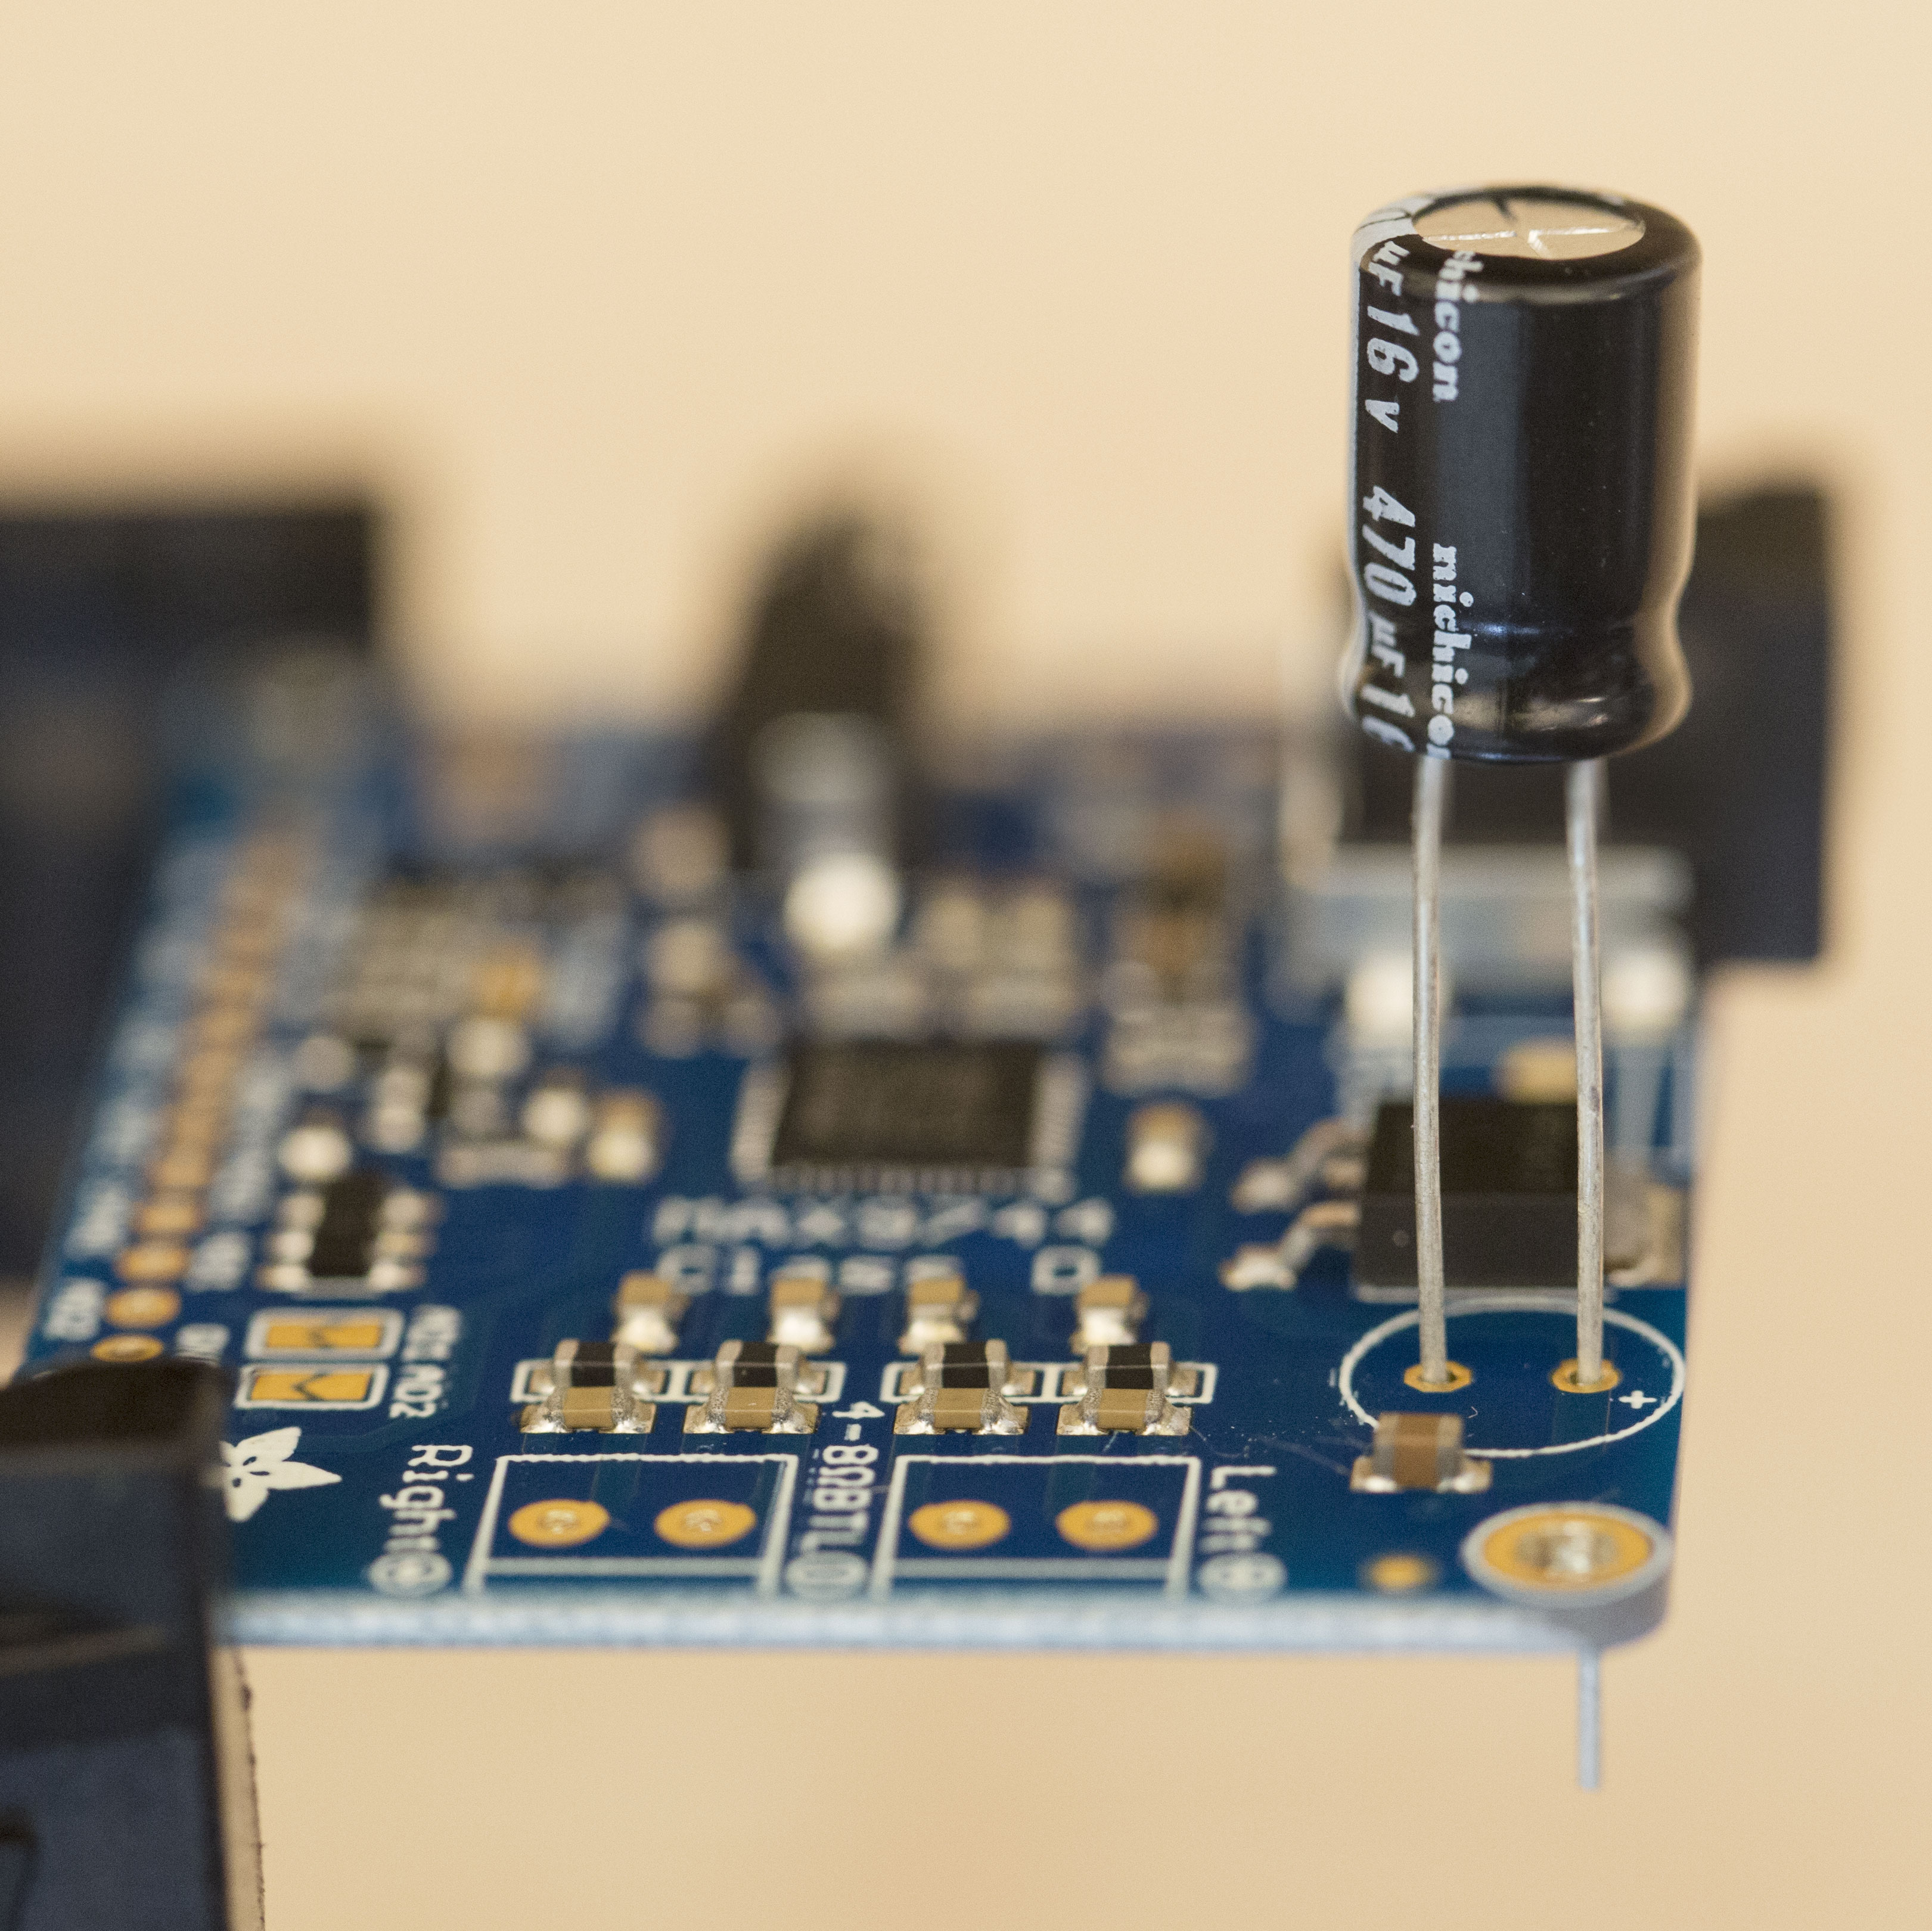 3d_printing_power-filter-capacitor.jpg